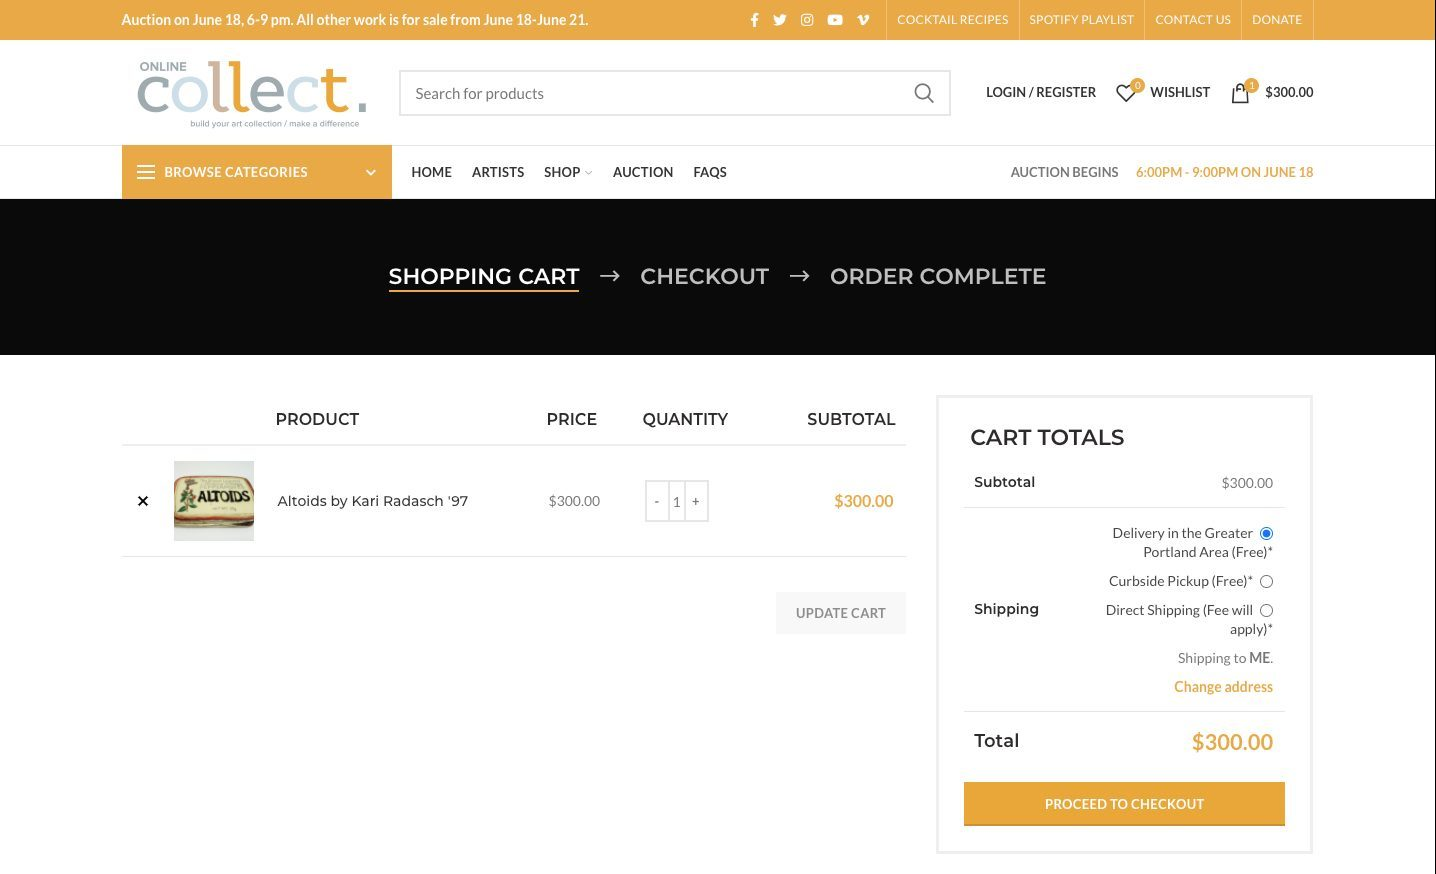 Meca online collect shopping cart